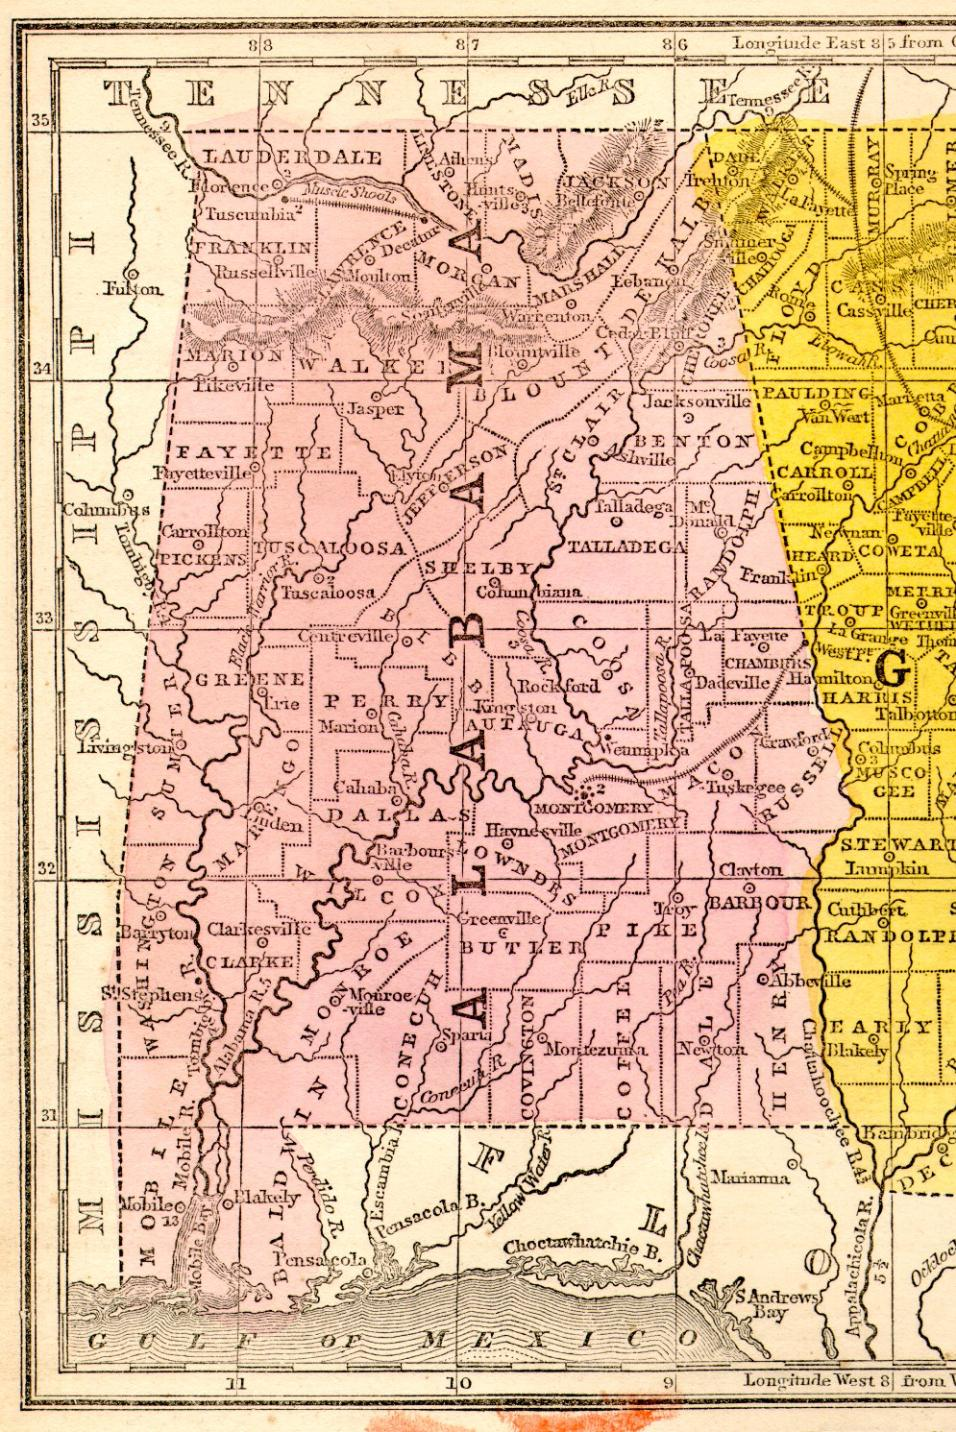 Alabama State Map - Alabama state map